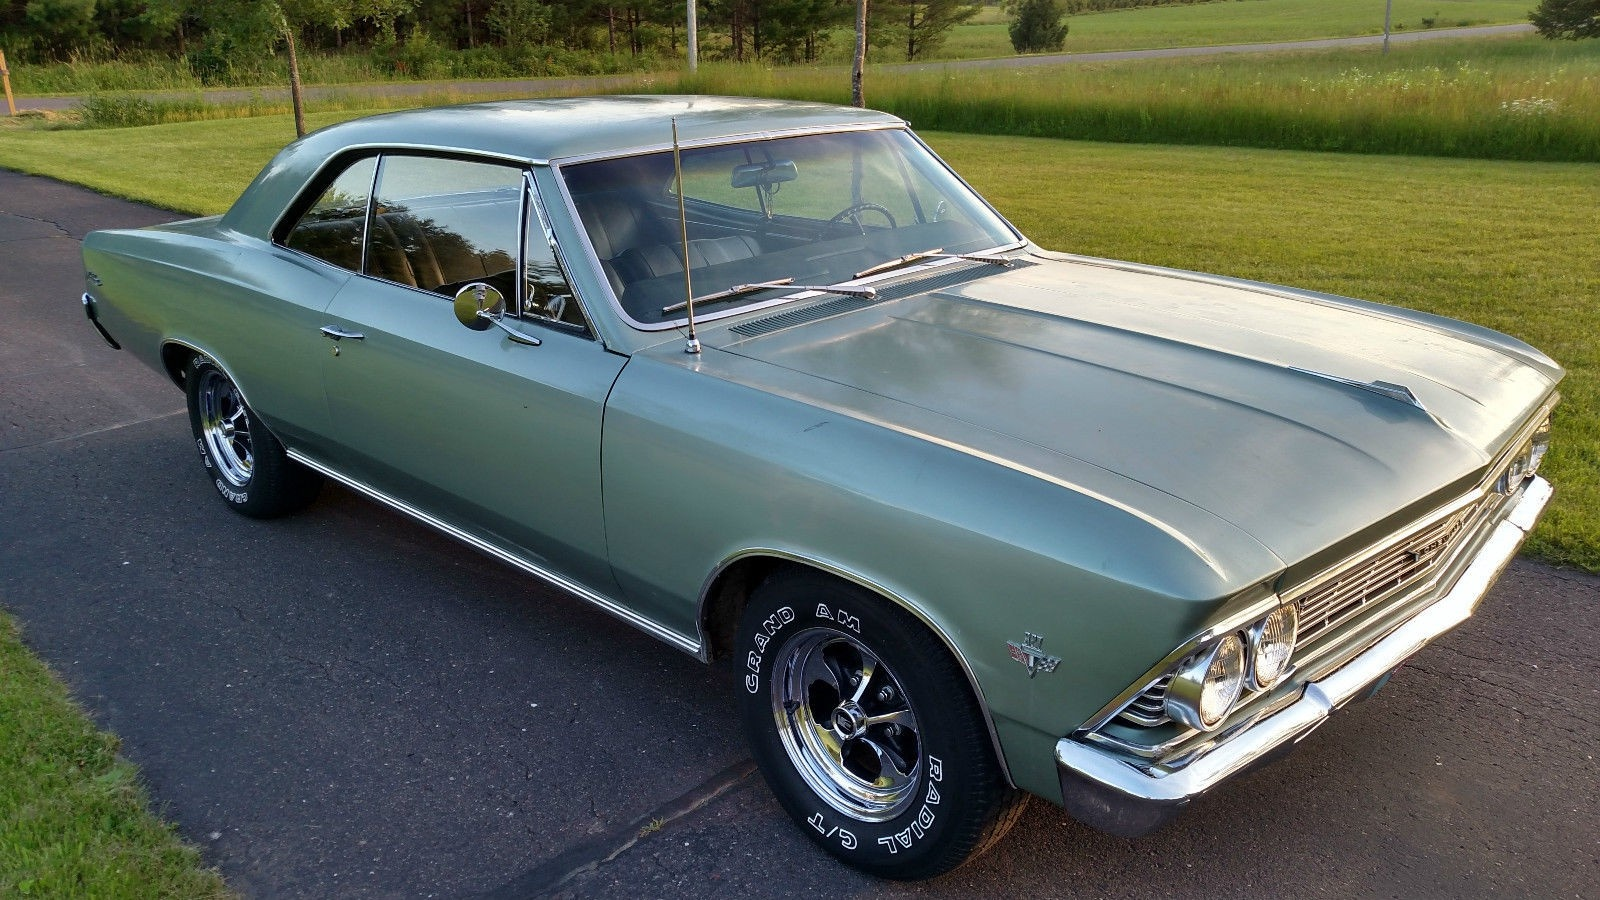 1966 Chevrolet Impala  User Reviews  CarGurus